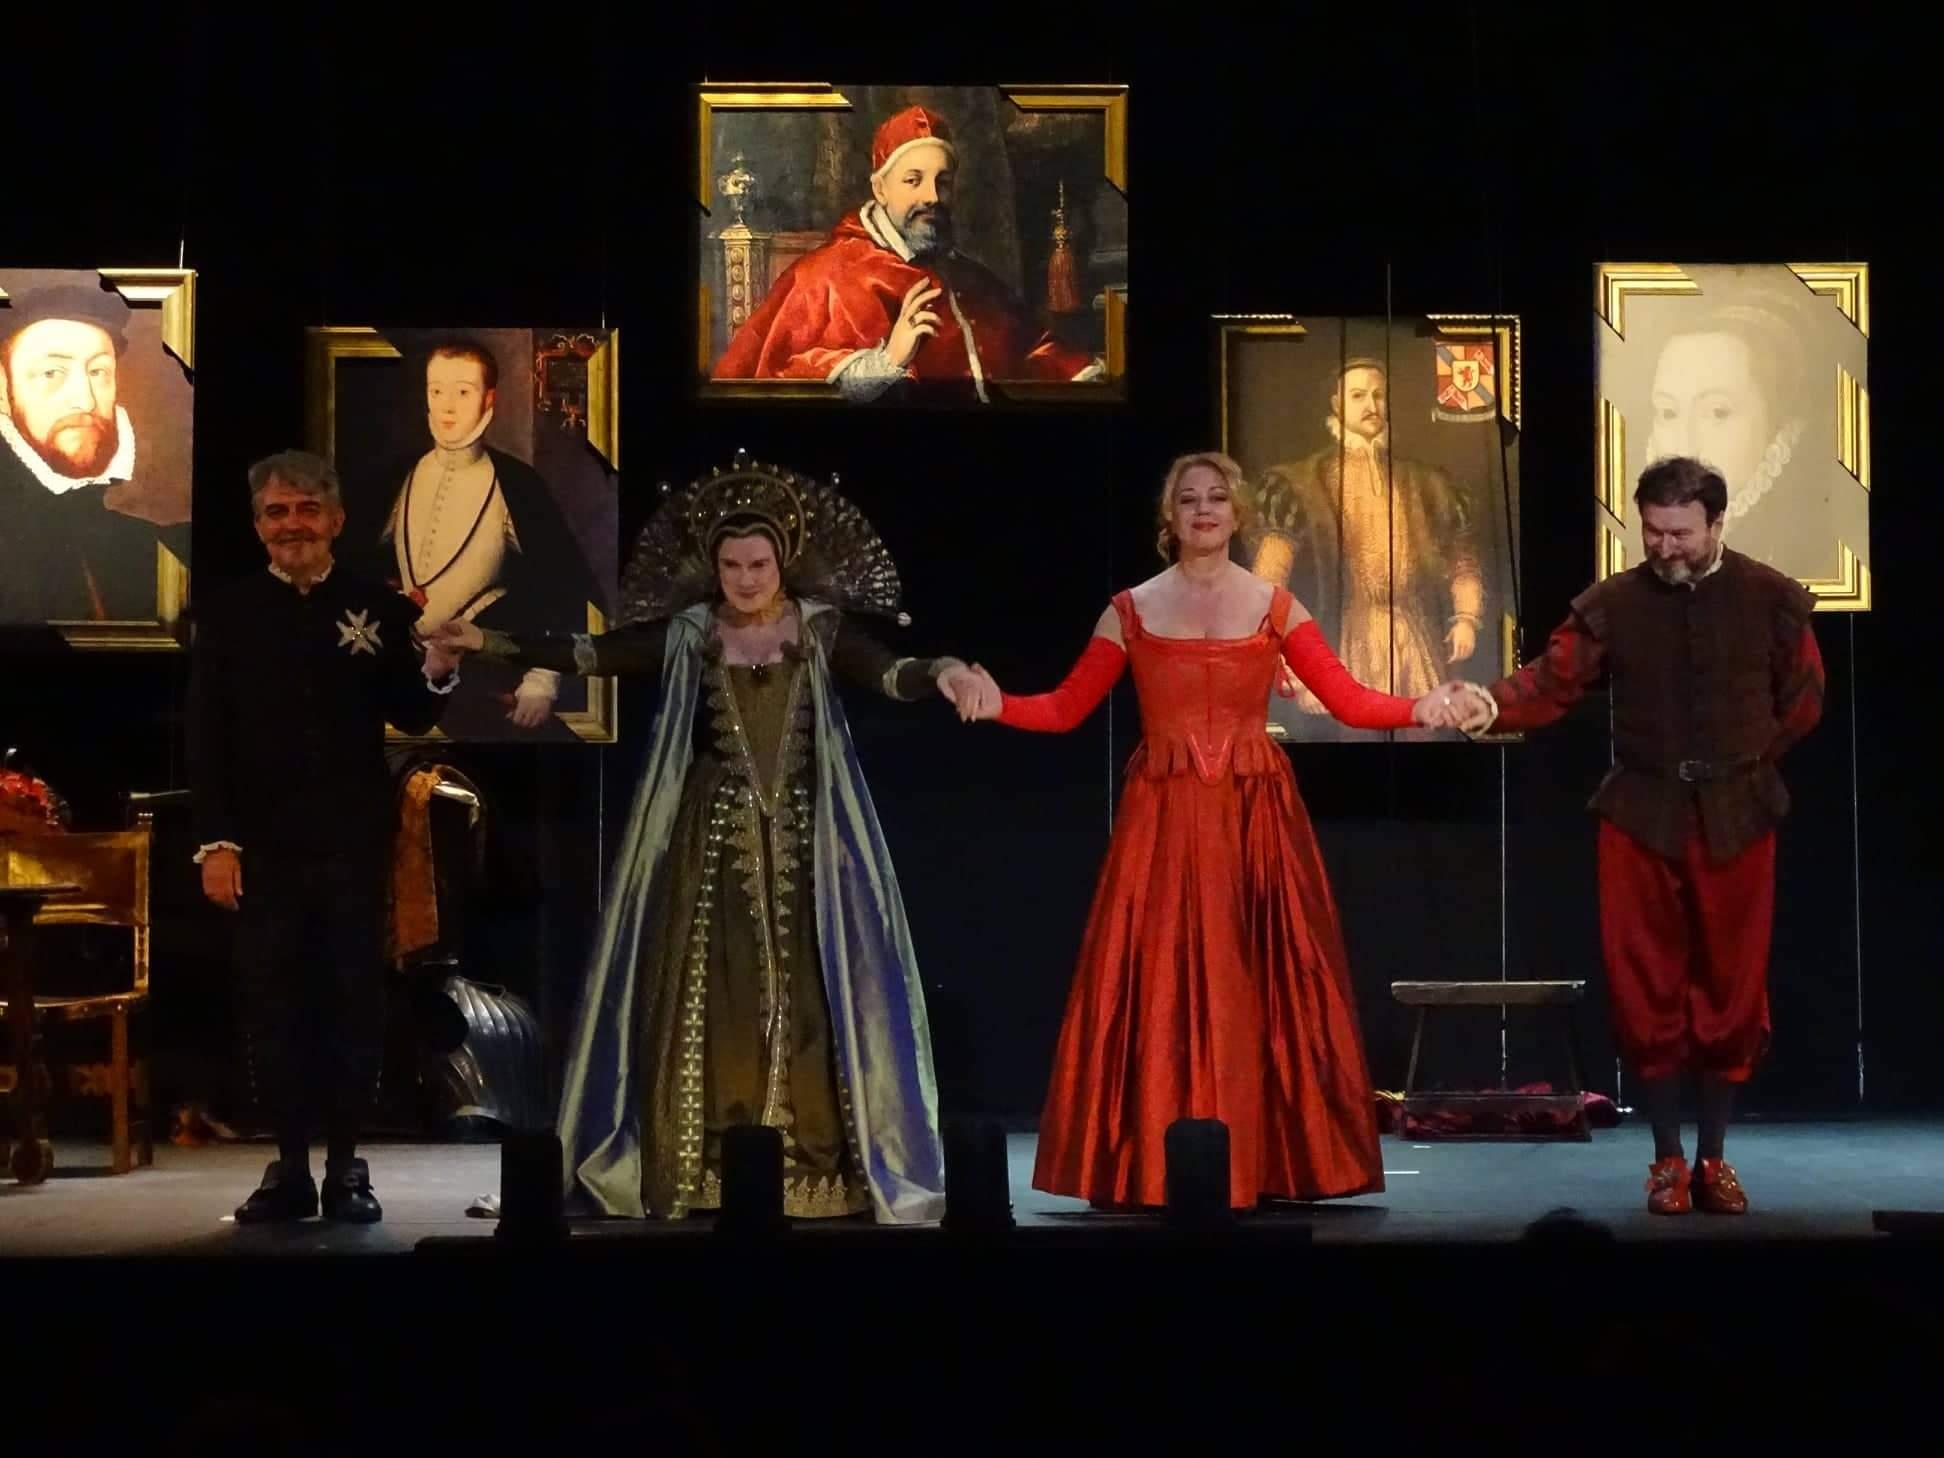 Merecido homenaje a Manuel Canseco, en el 9º Festival de Teatro y Títeres de Torralba de Calatrava 3